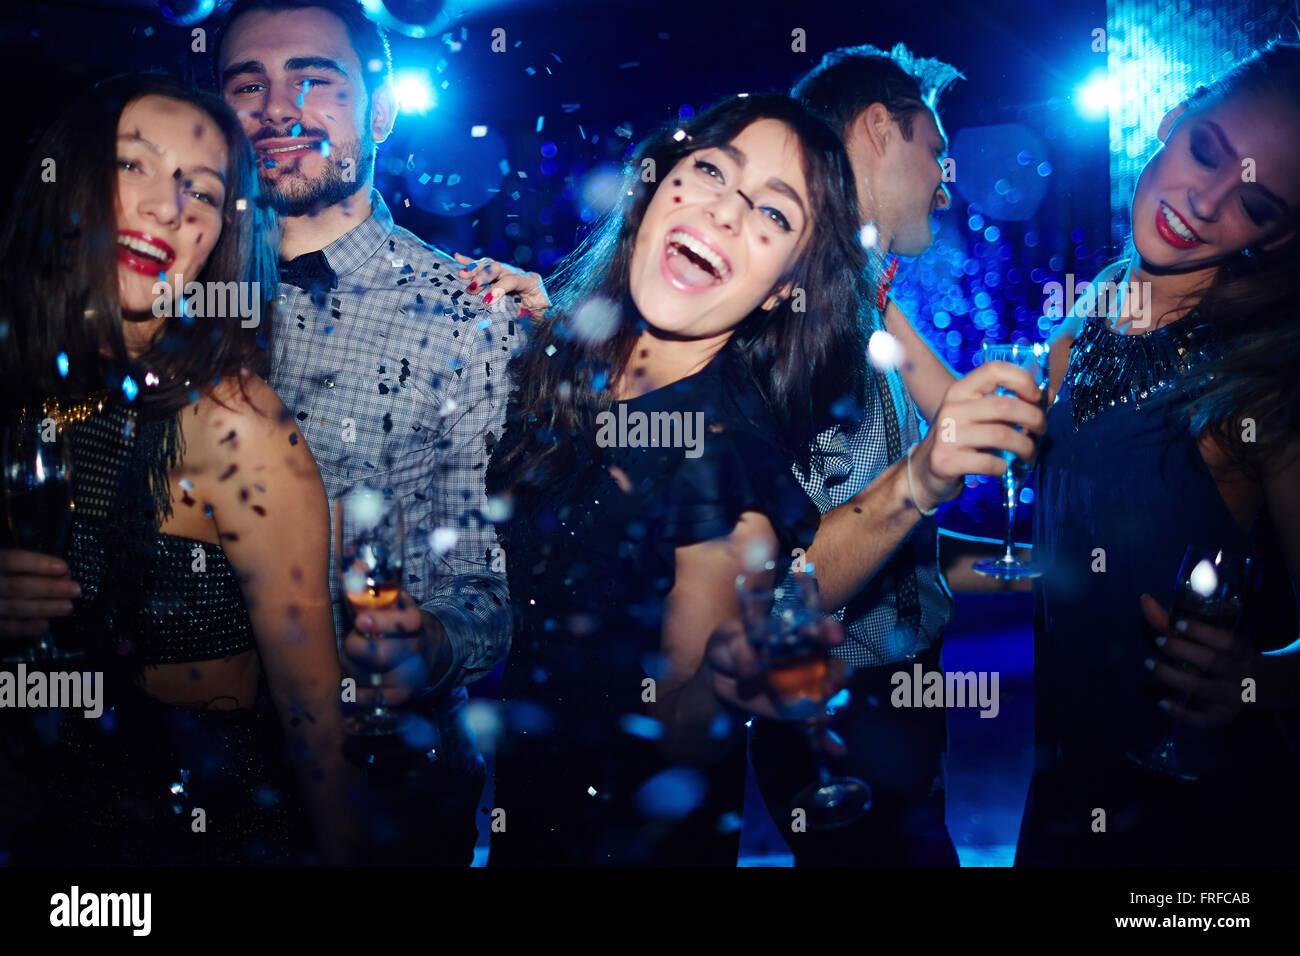 Tanzen auf party Stockbild